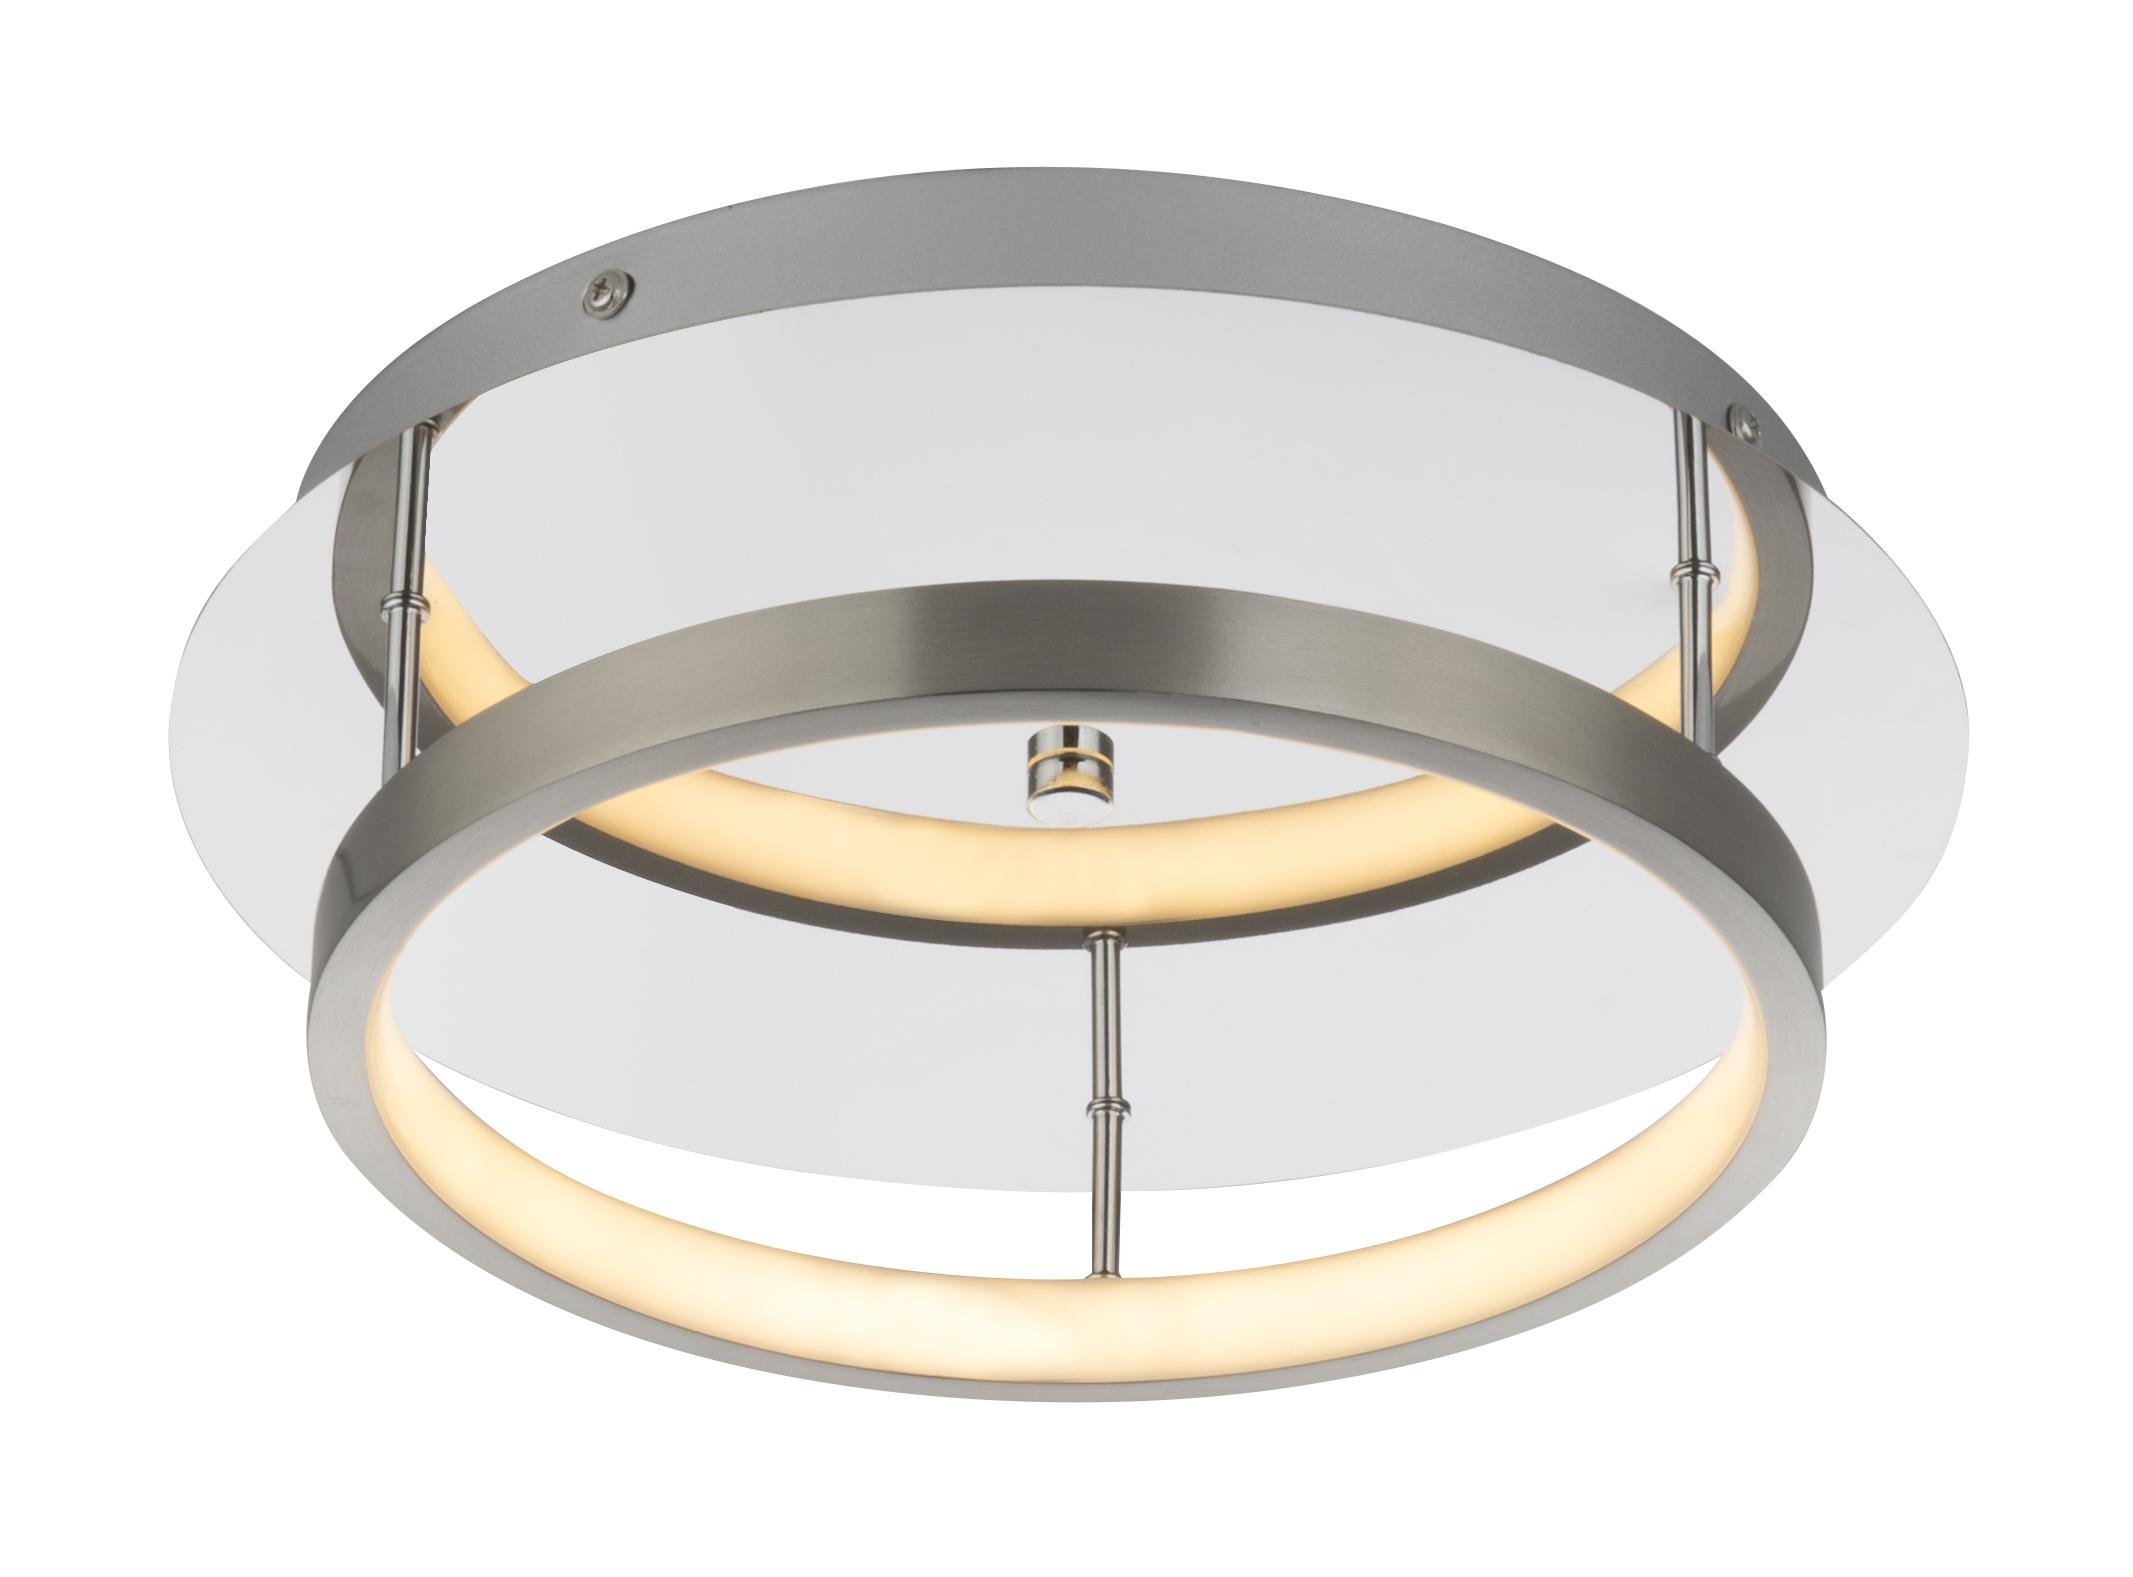 titus schlafzimmer r ume produkte globo lighting leuchten lampen online kaufen. Black Bedroom Furniture Sets. Home Design Ideas